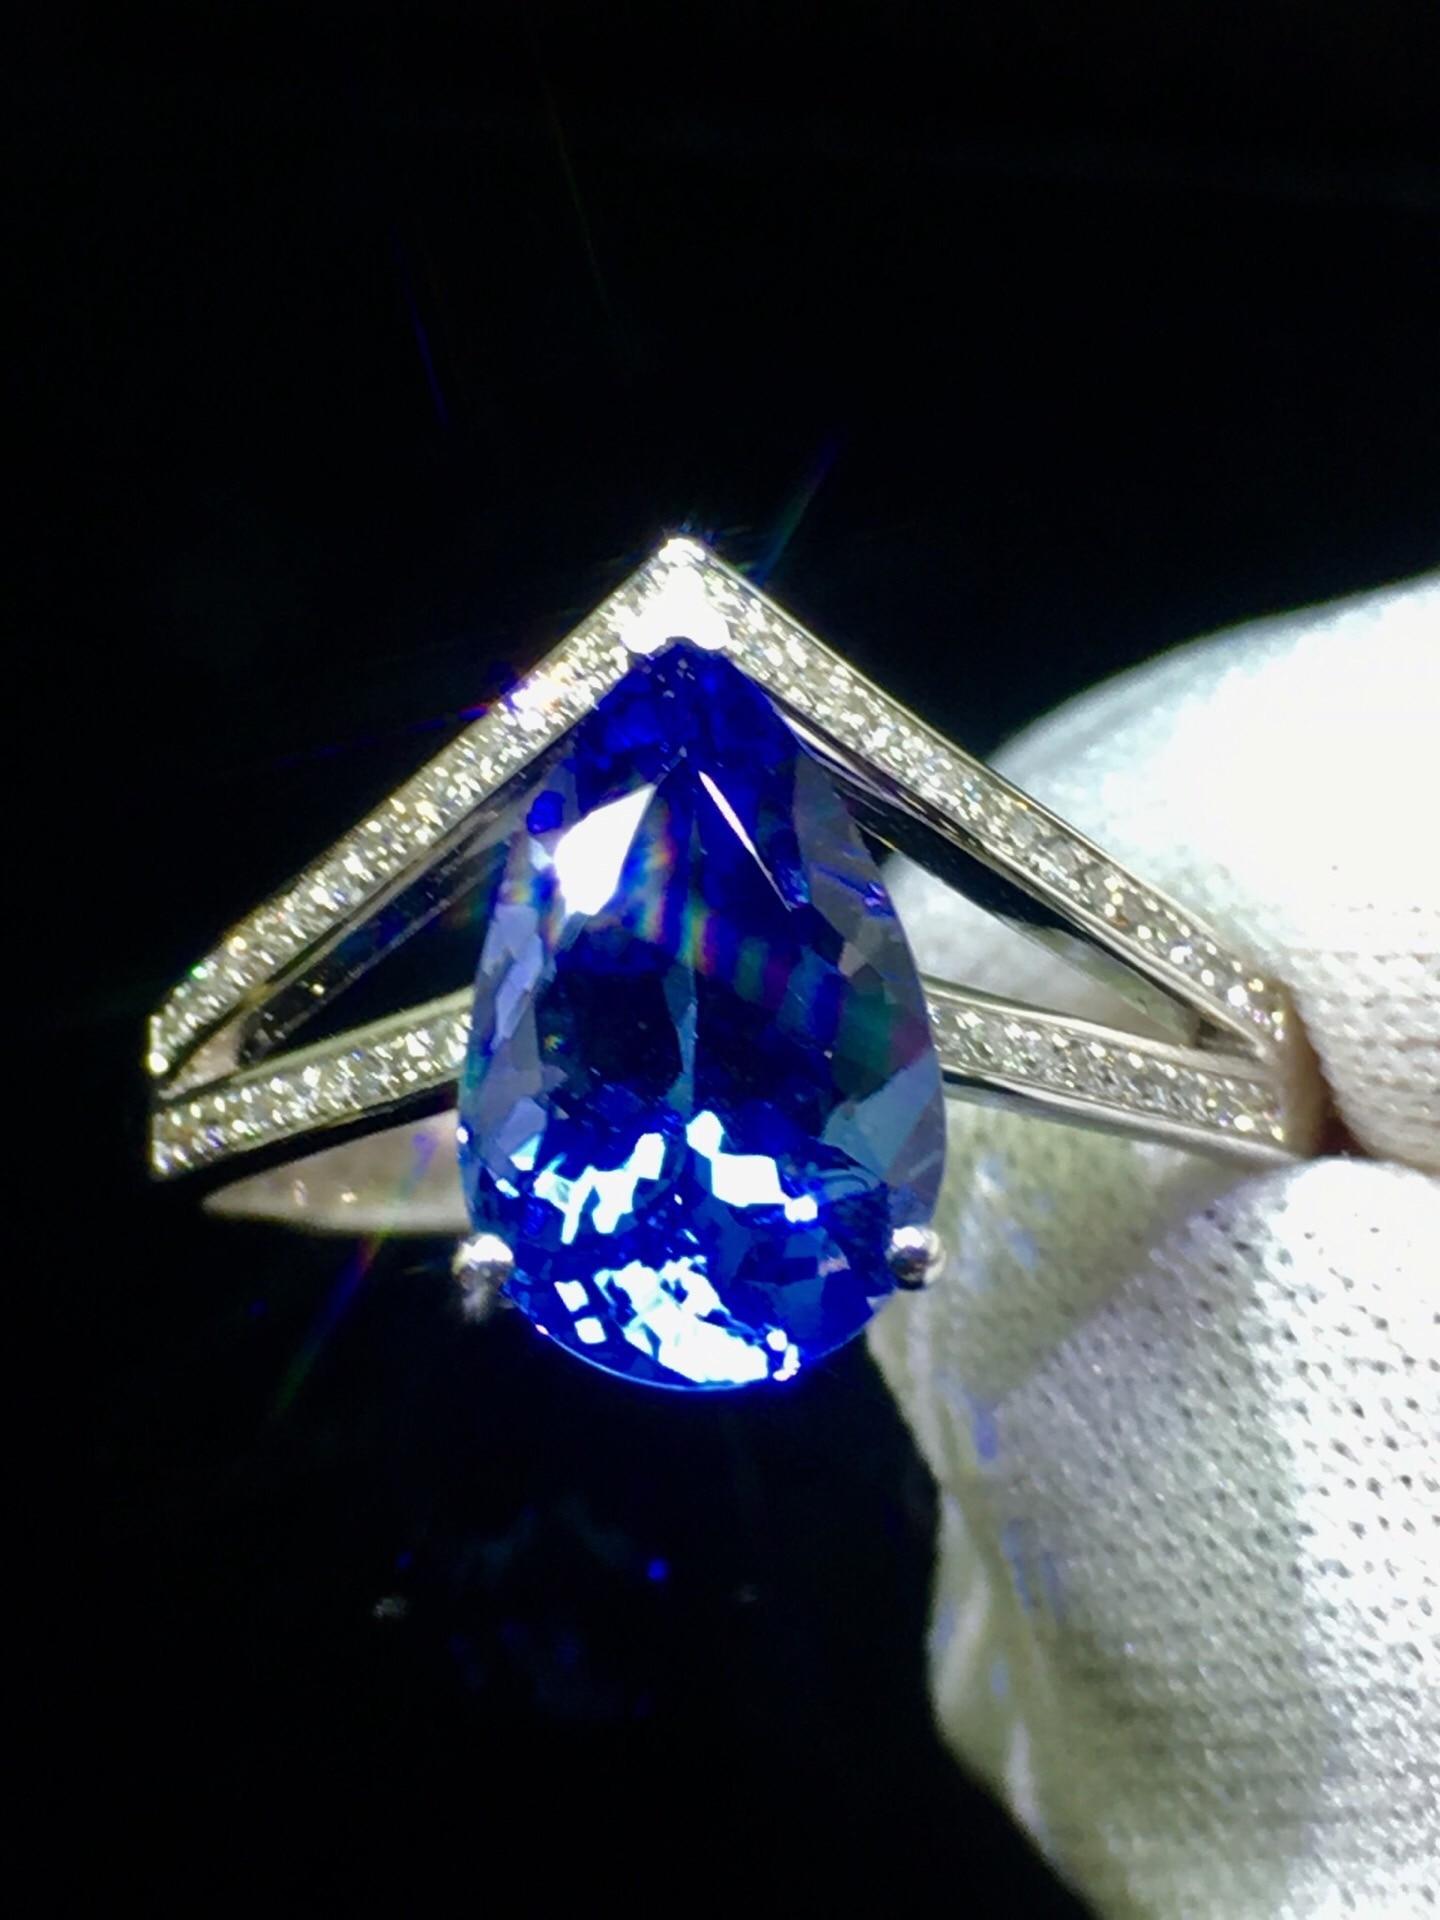 Finr Jewelry 18K White Gold 100% Natural Tanzania Origin Blue Tanzanite Gemstone 2.3ct Female's Ring for Women' Fine Rings